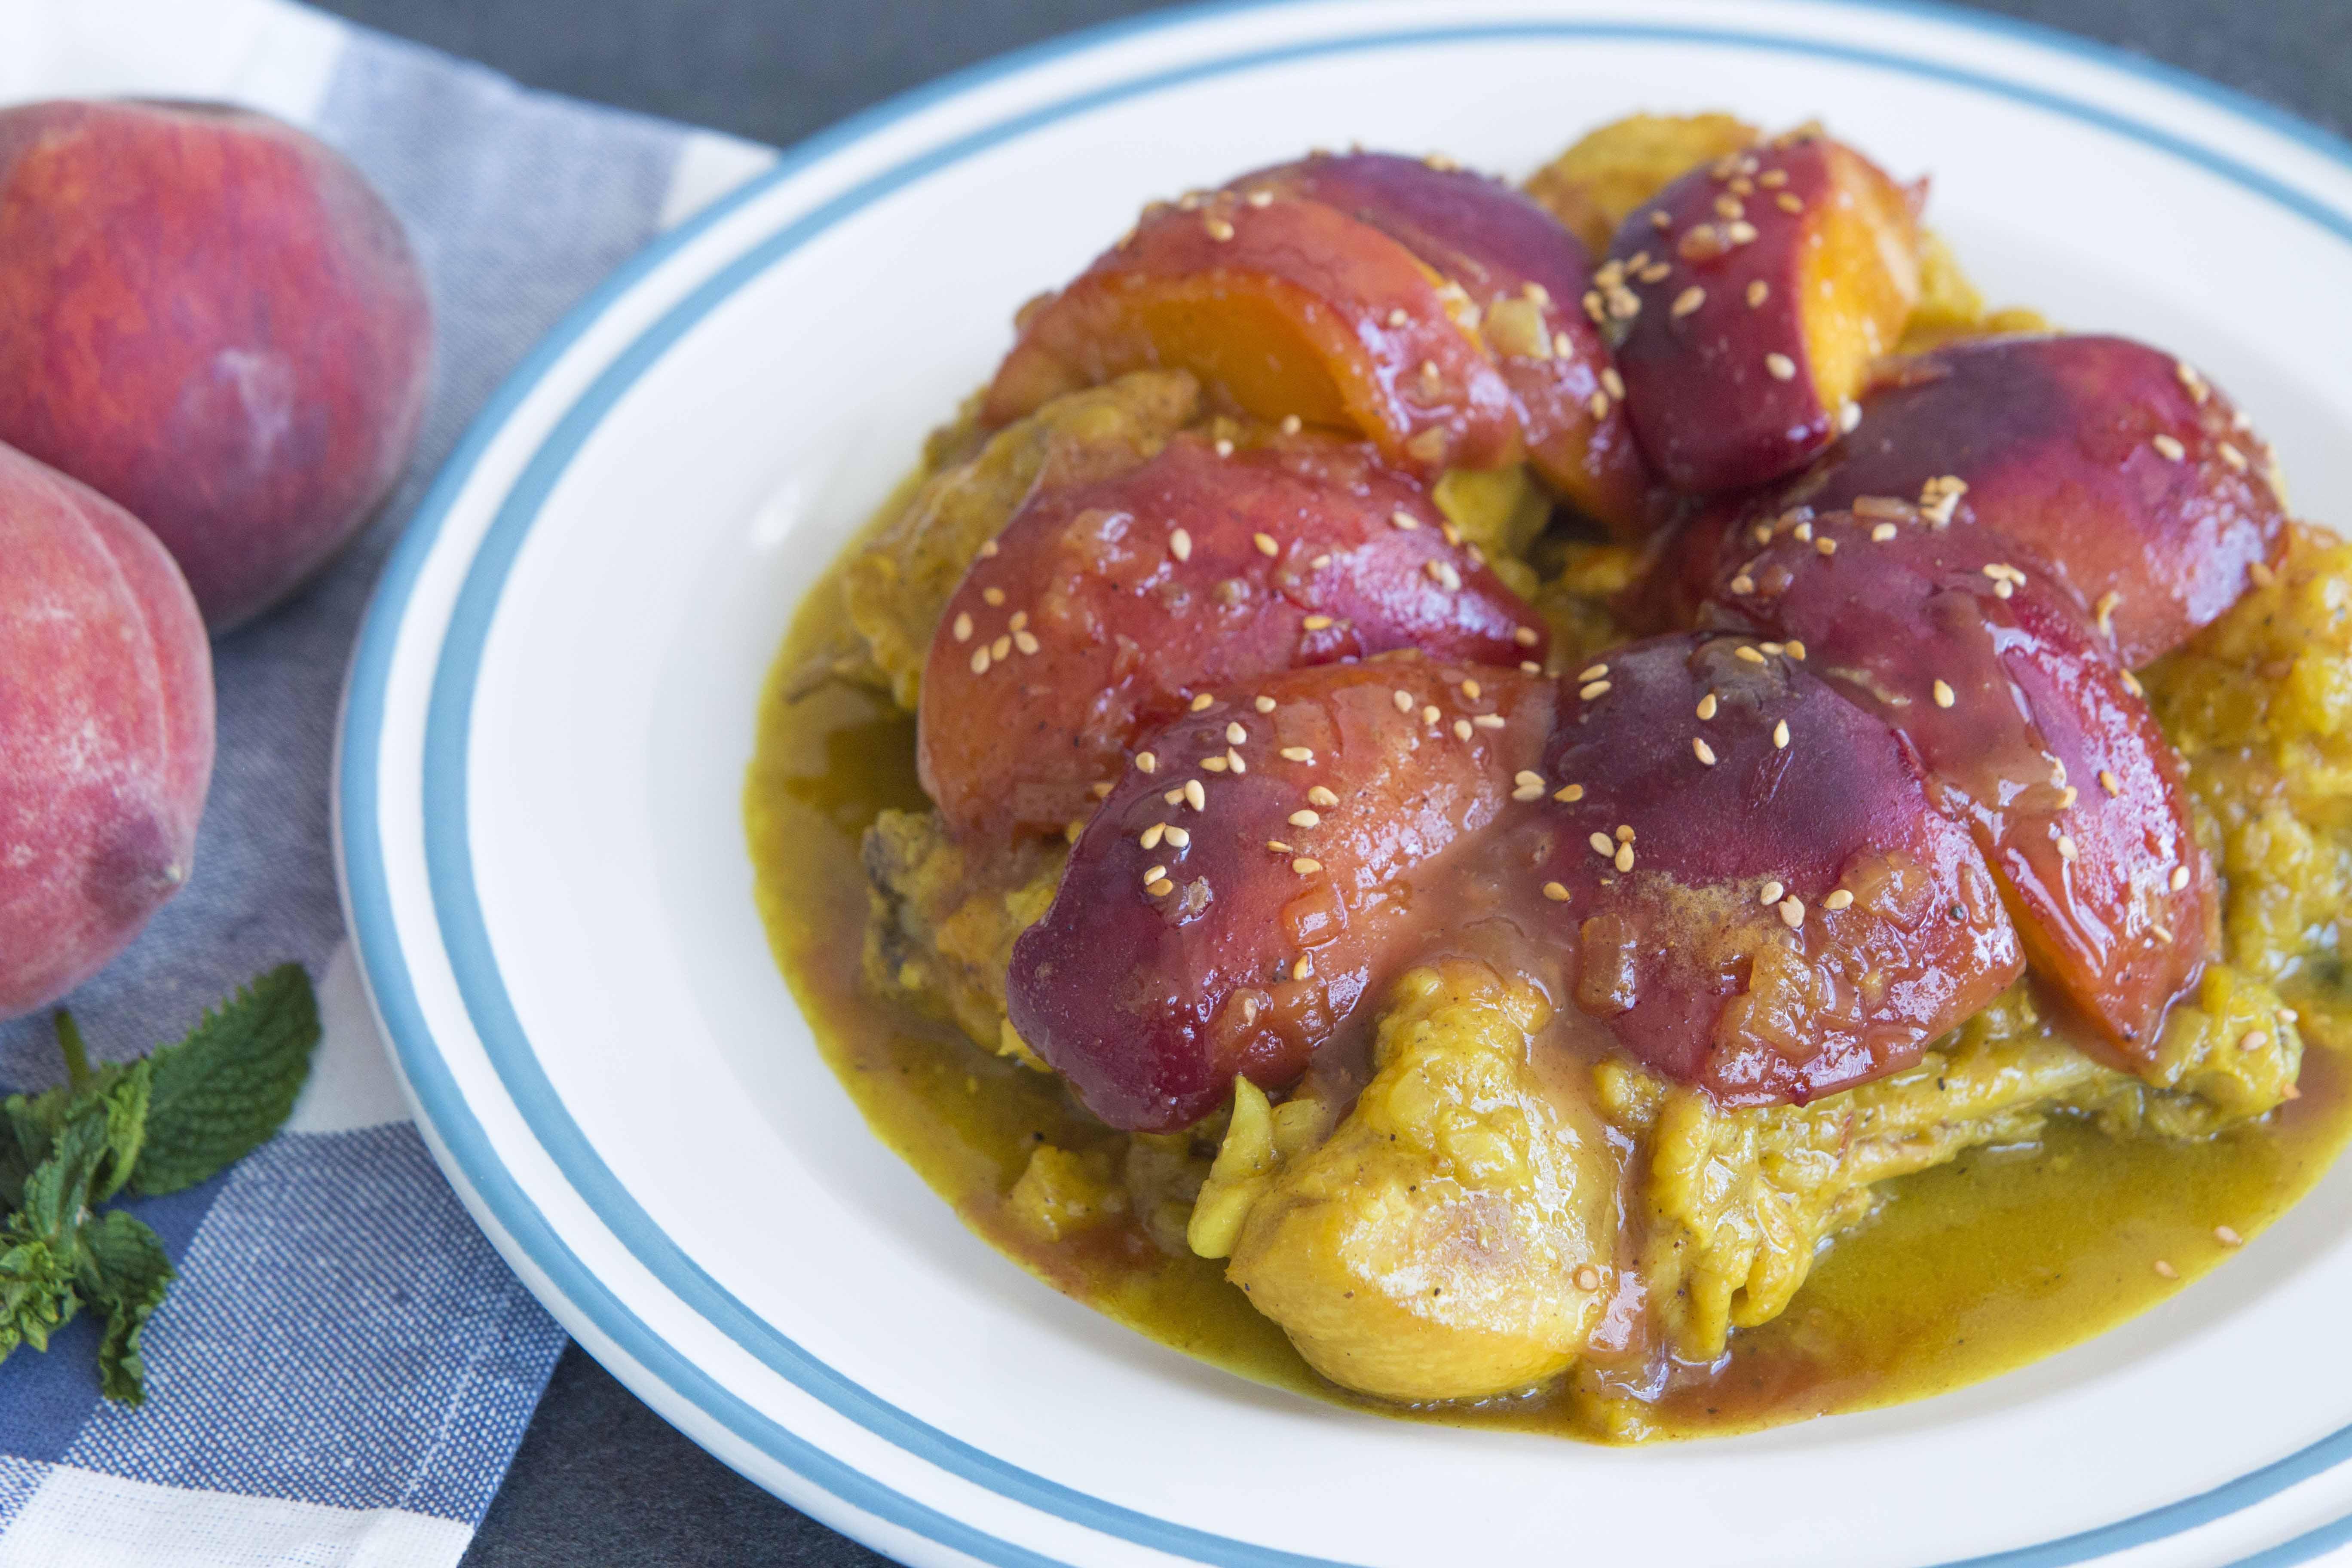 685- Caramelized Peaches Tagine / طاجين بالخوخ المعسل